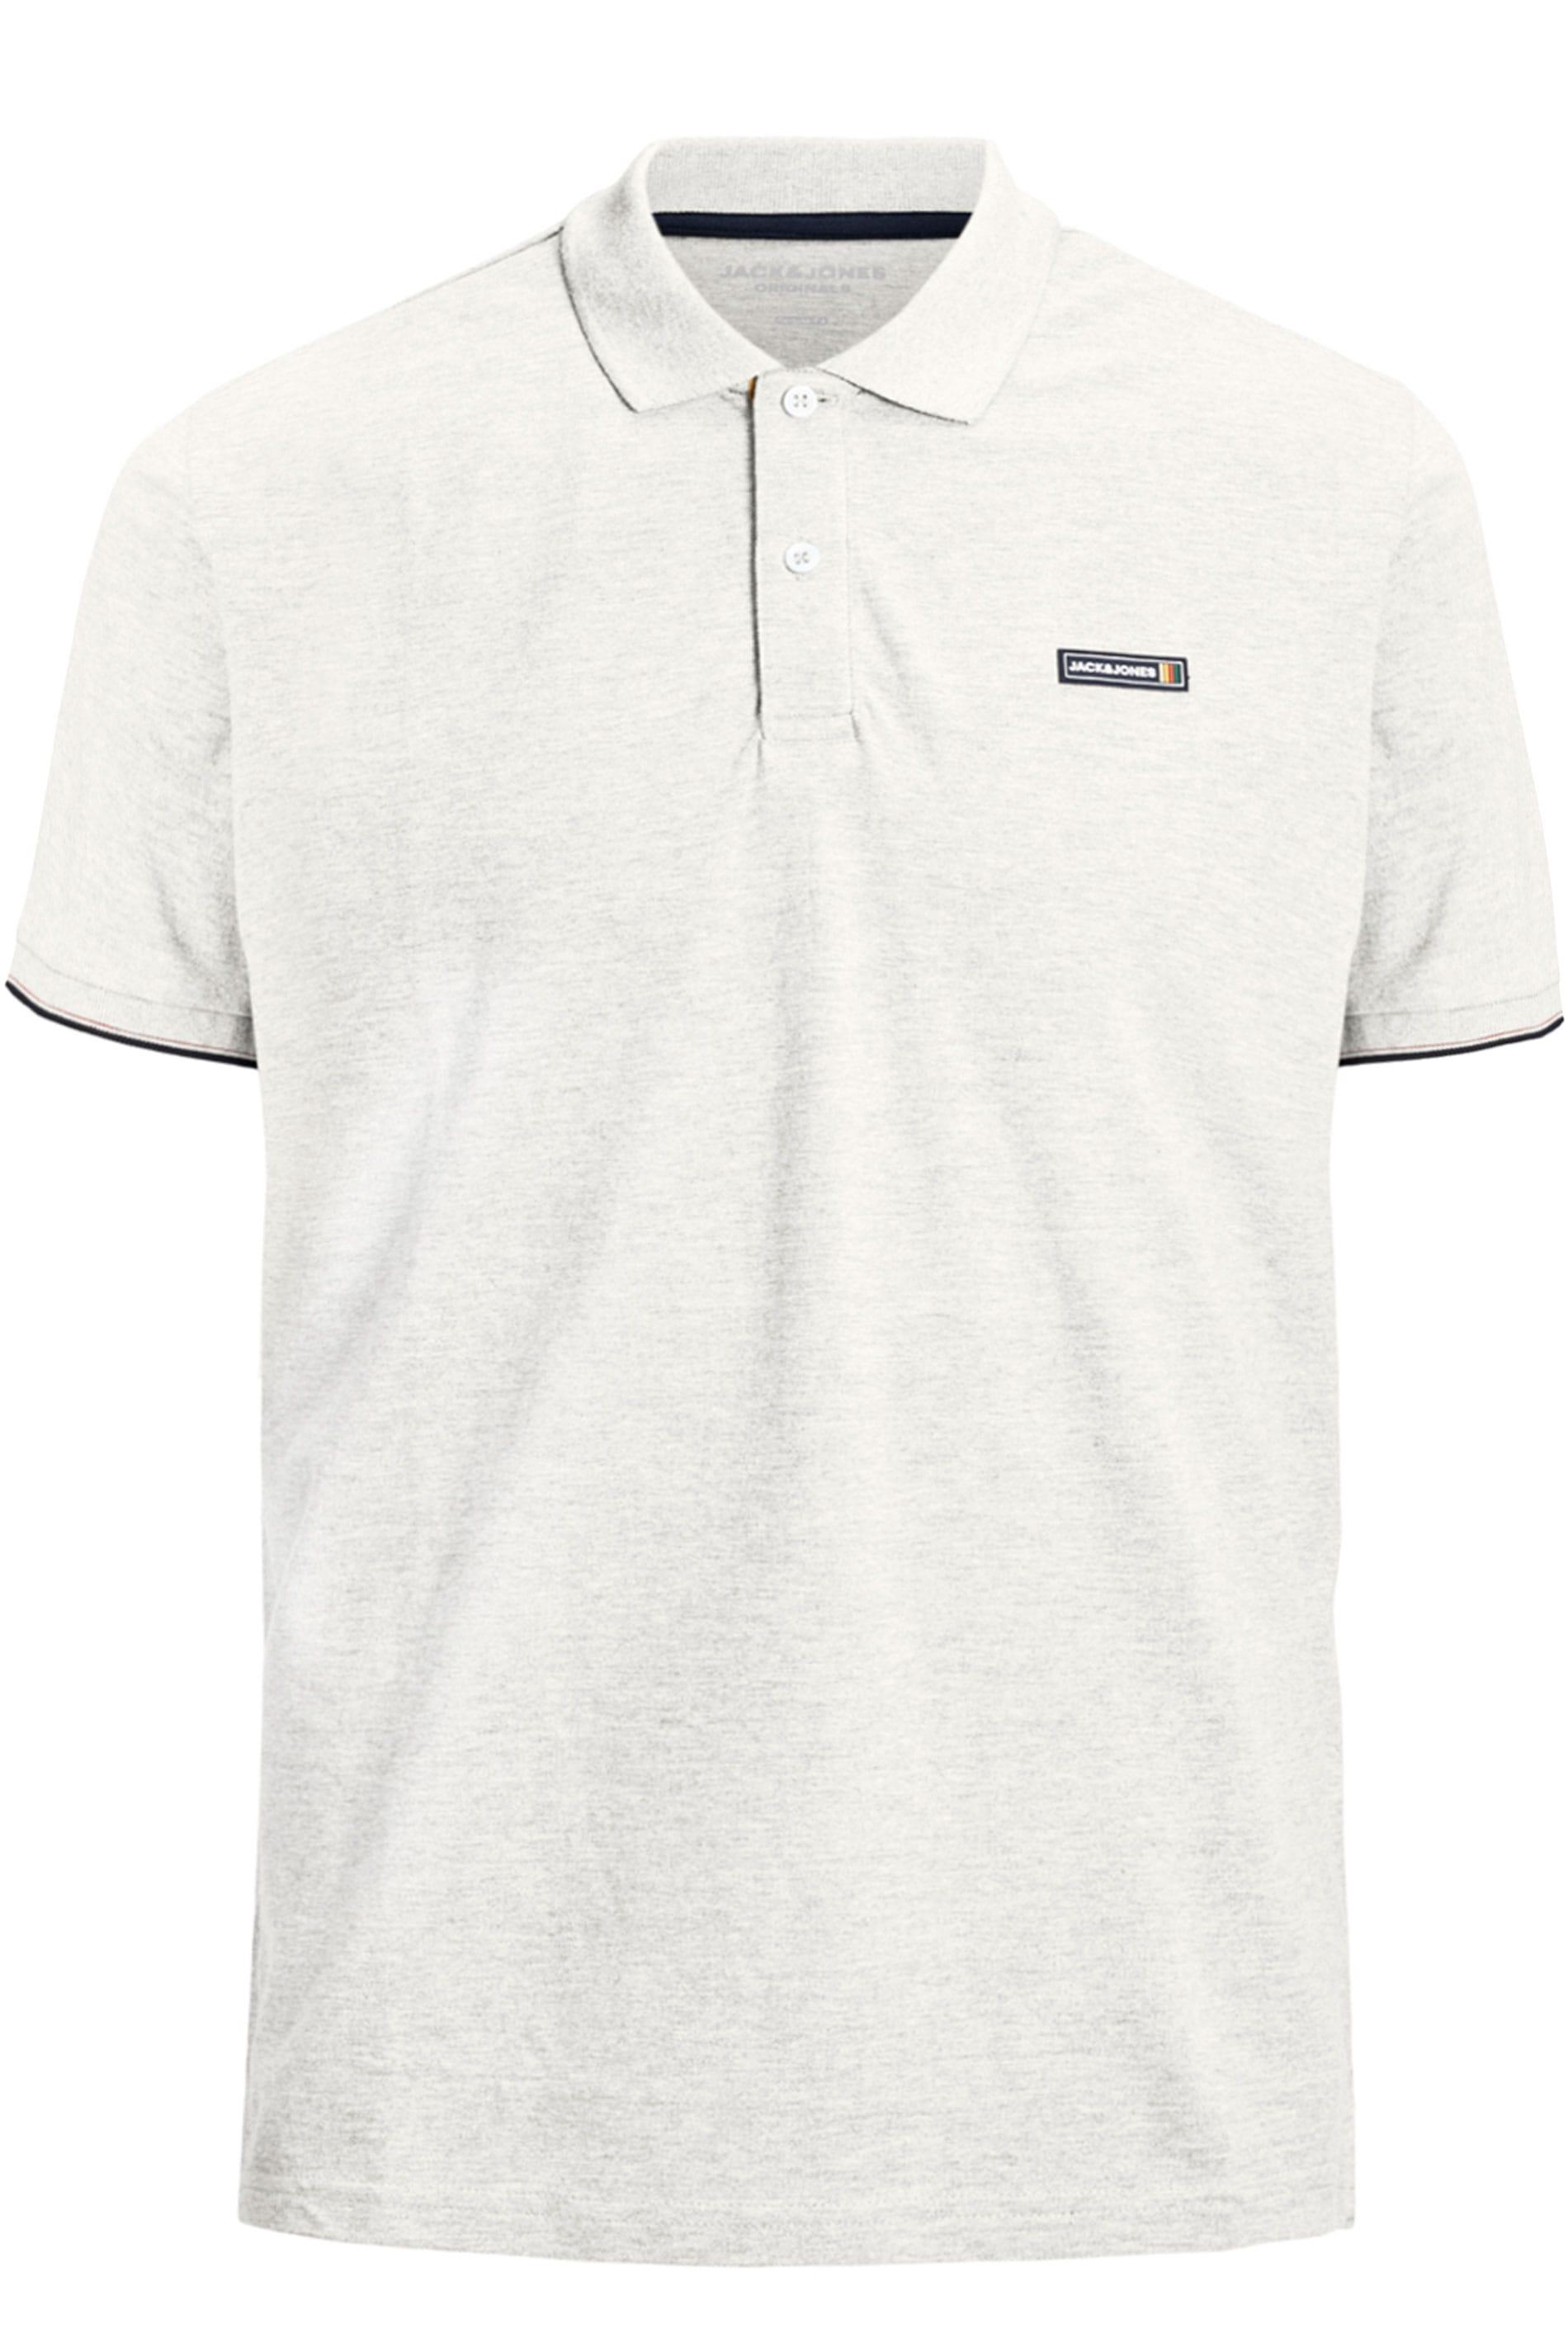 JACK & JONES White Logo Badge Polo Shirt